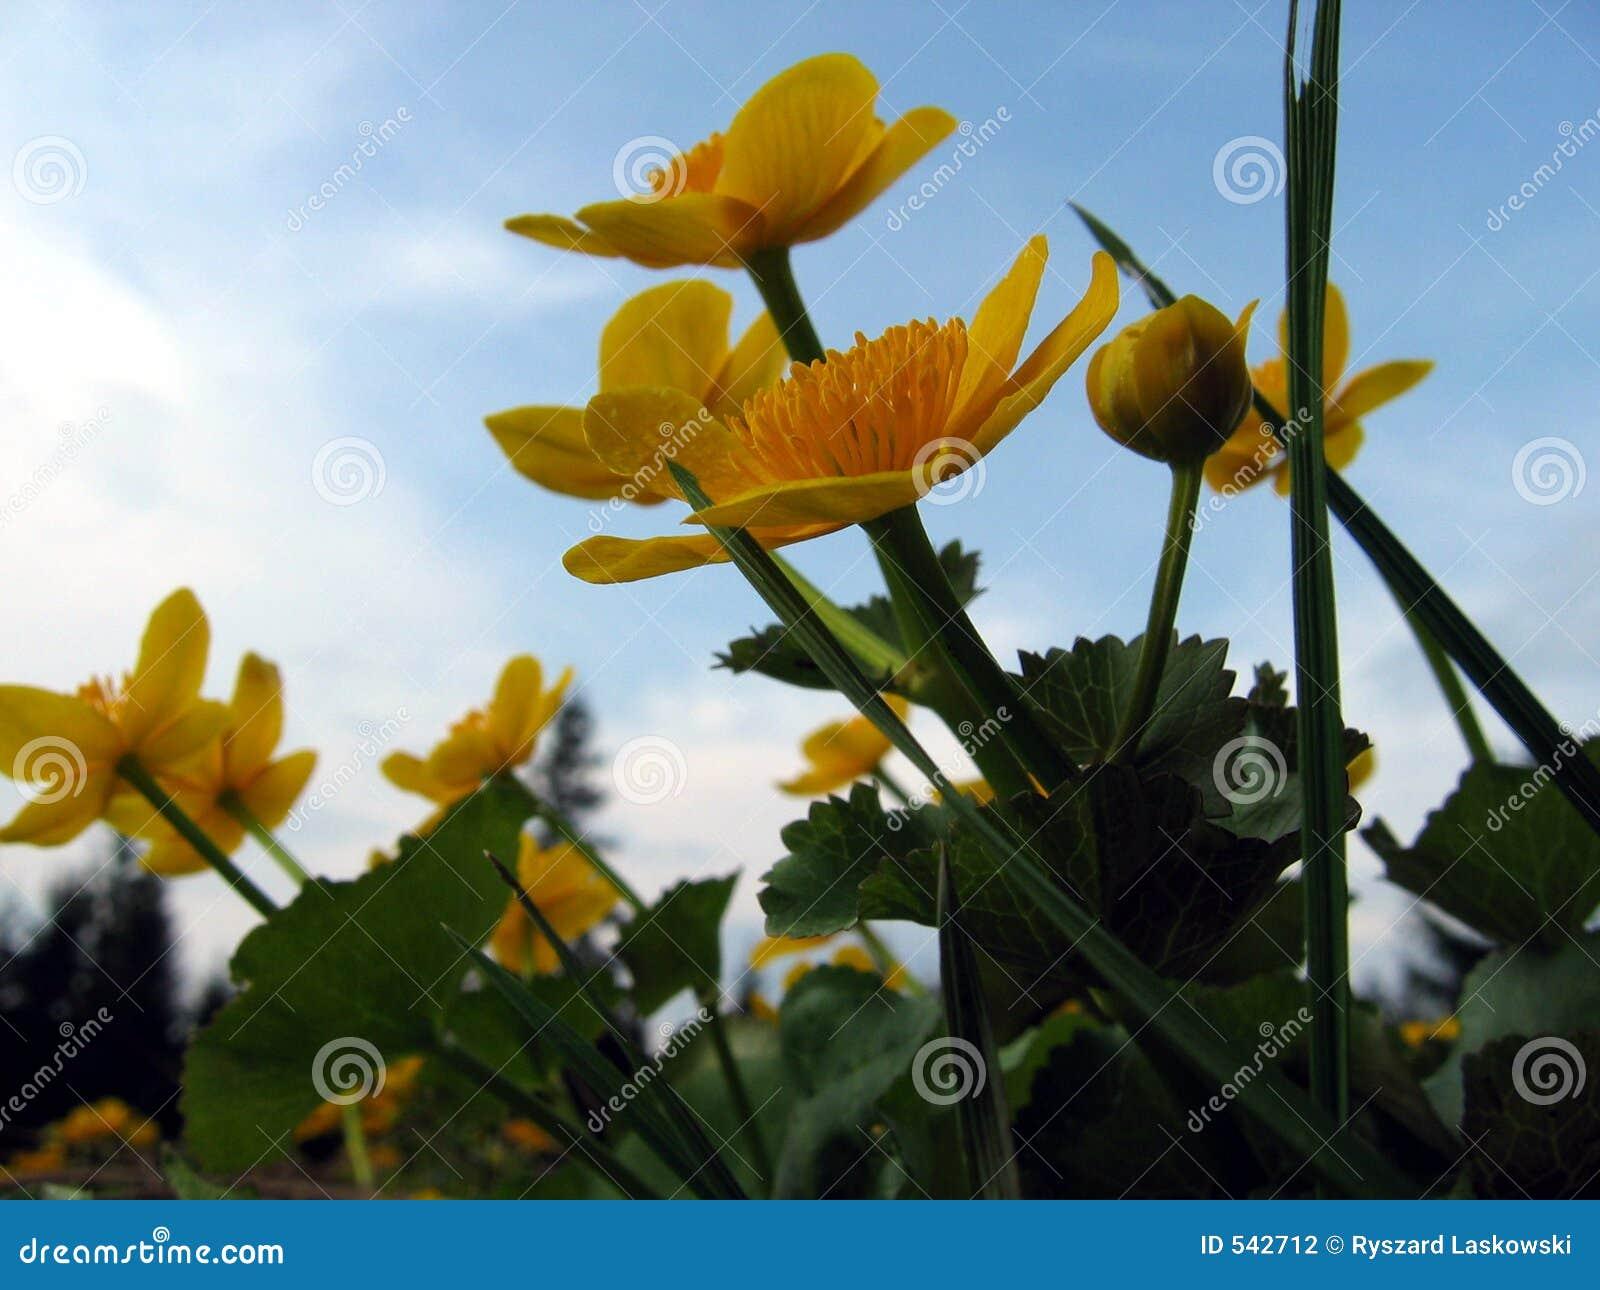 Download 万寿菊沼泽 库存照片. 图片 包括有 黄色, 宏指令, 沼泽, 春天, 万寿菊, 欧洲, 波兰, 天空, 工厂 - 542712